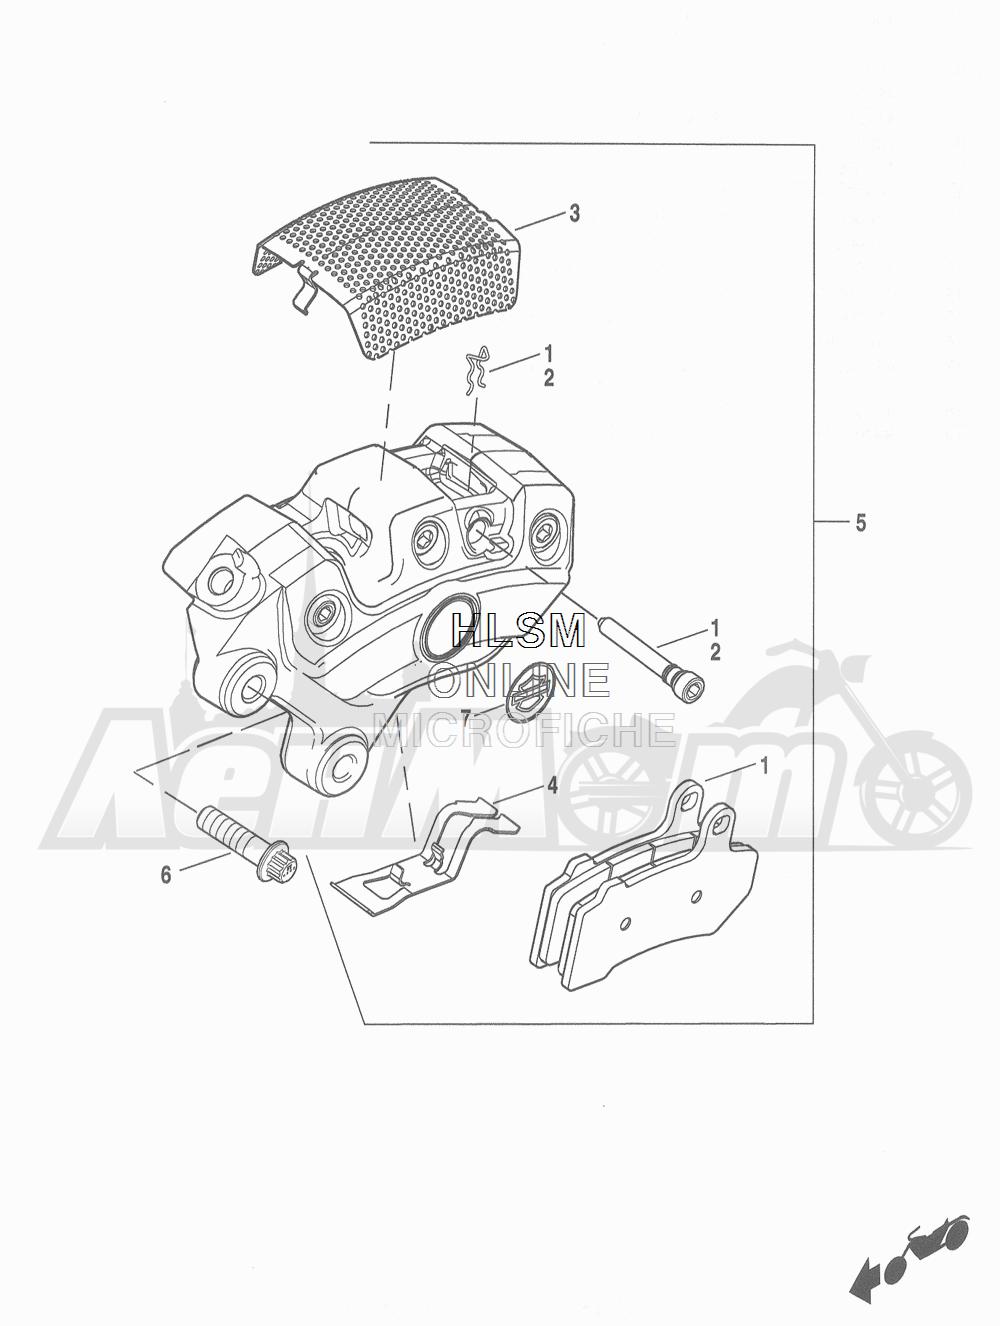 Запчасти для Мотоцикла Harley-Davidson 2016 FLHR ROAD KING (FBM) Раздел: BRAKE - FRONT BRAKE CALIPER ASSEMBLY | передний тормоз тормозной суппорт в сборе